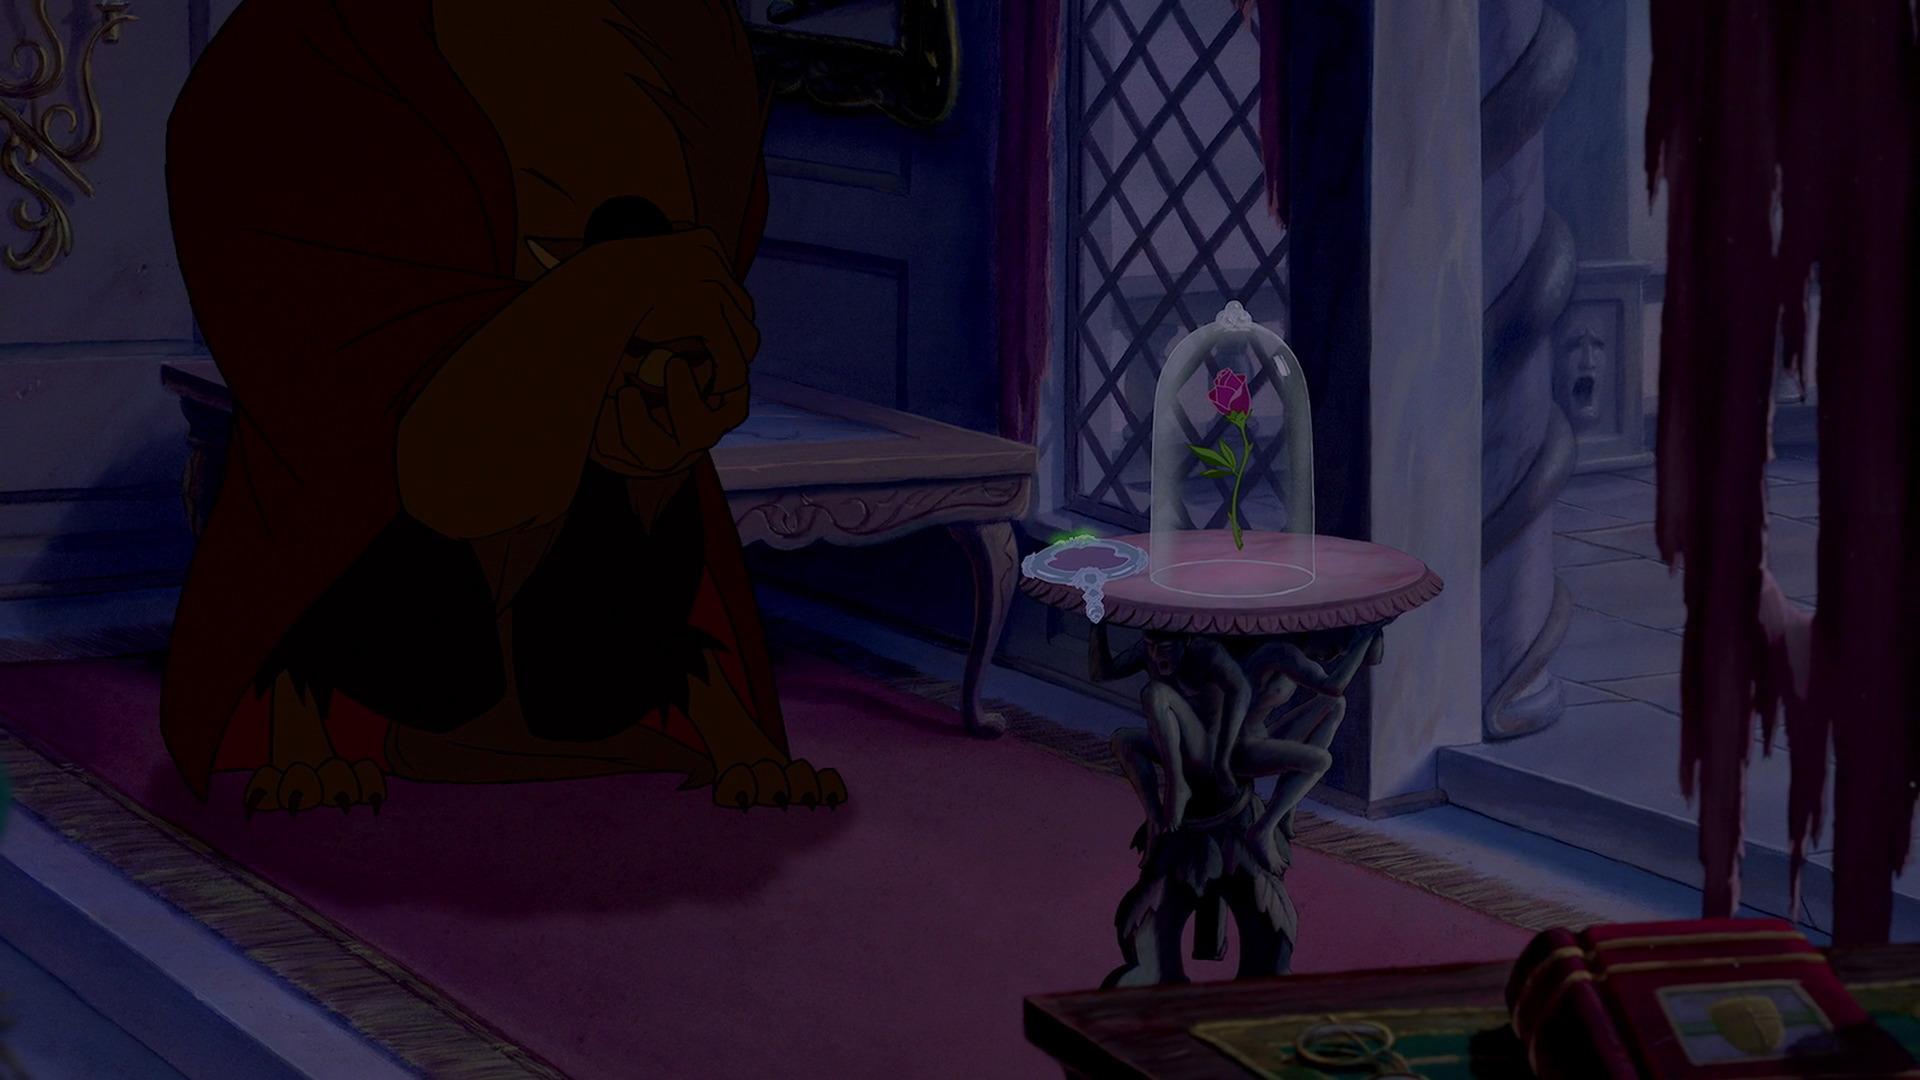 Image Beauty And The Beast Disneyscreencaps Com 50 Jpg